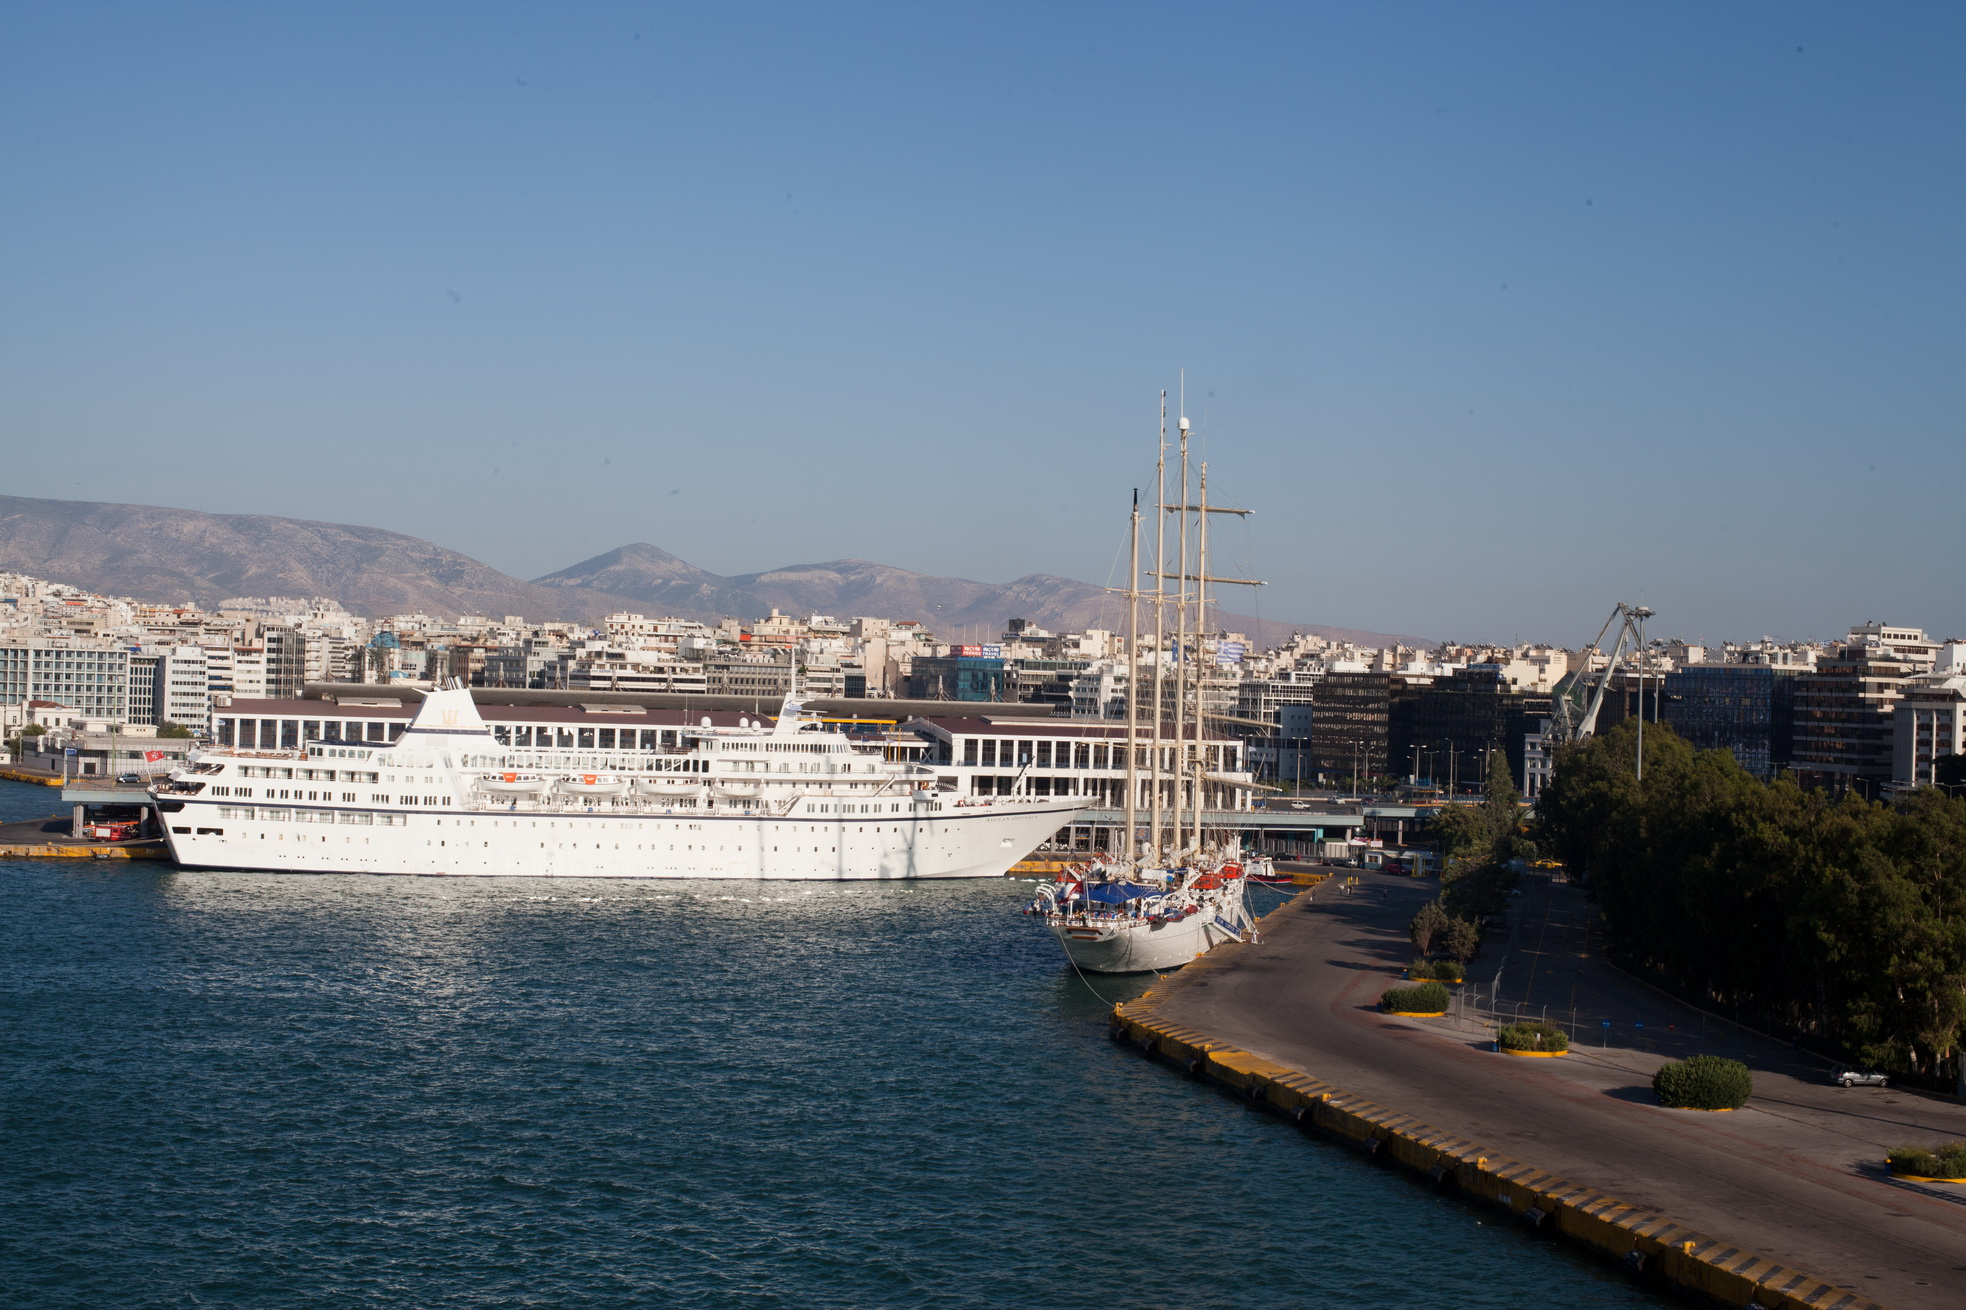 MS Aegean Odyssey IMO 7225910 docked Piraeus Port of Athens Greece 05